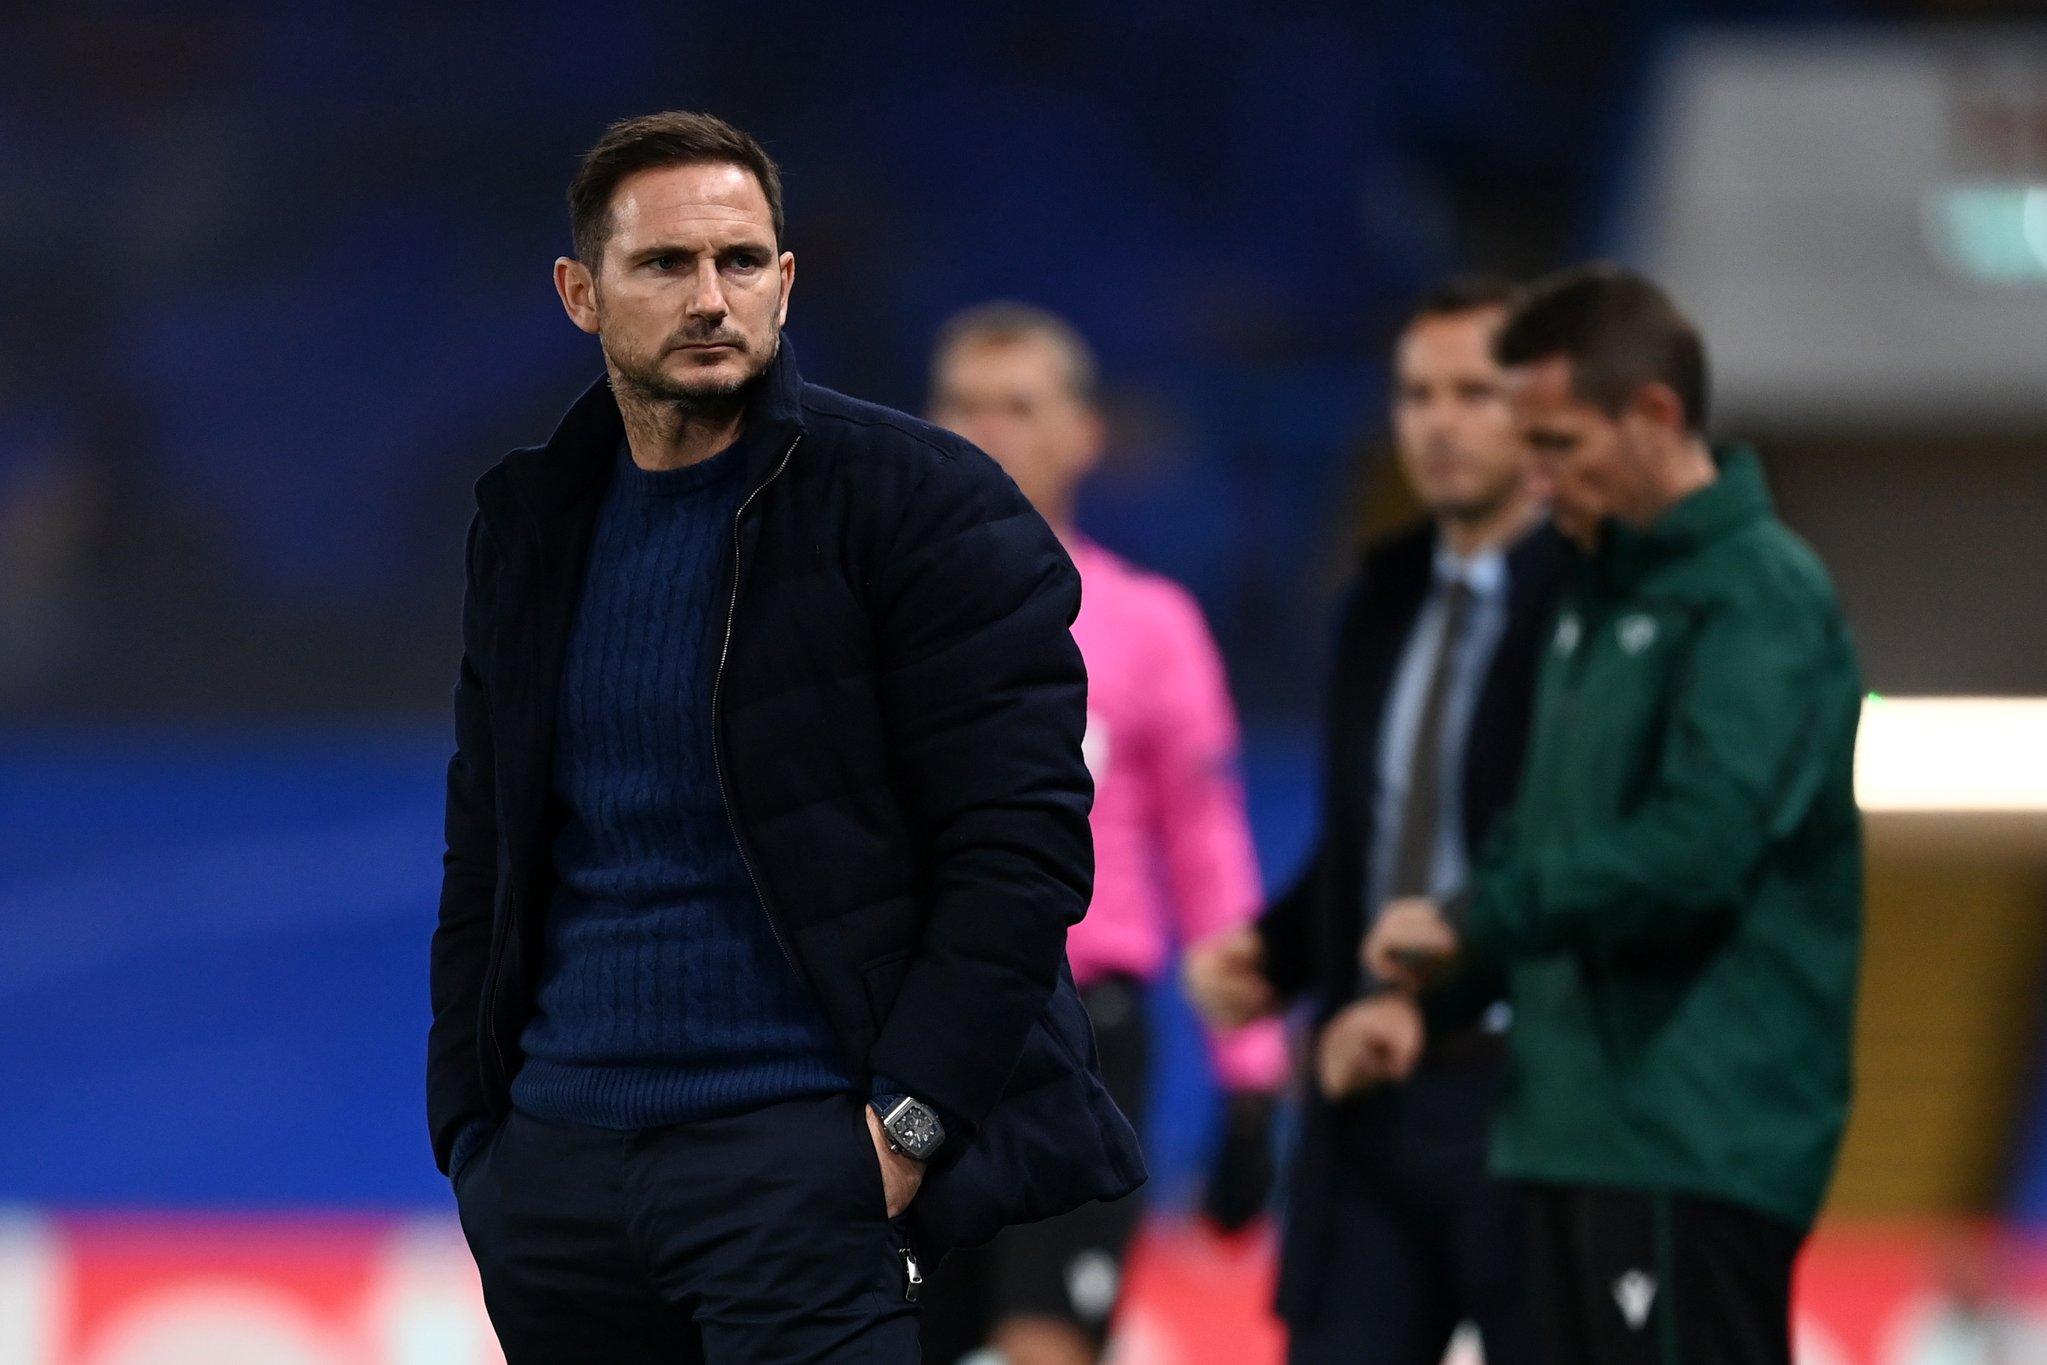 Frank Lampard has got Chelsea firing again